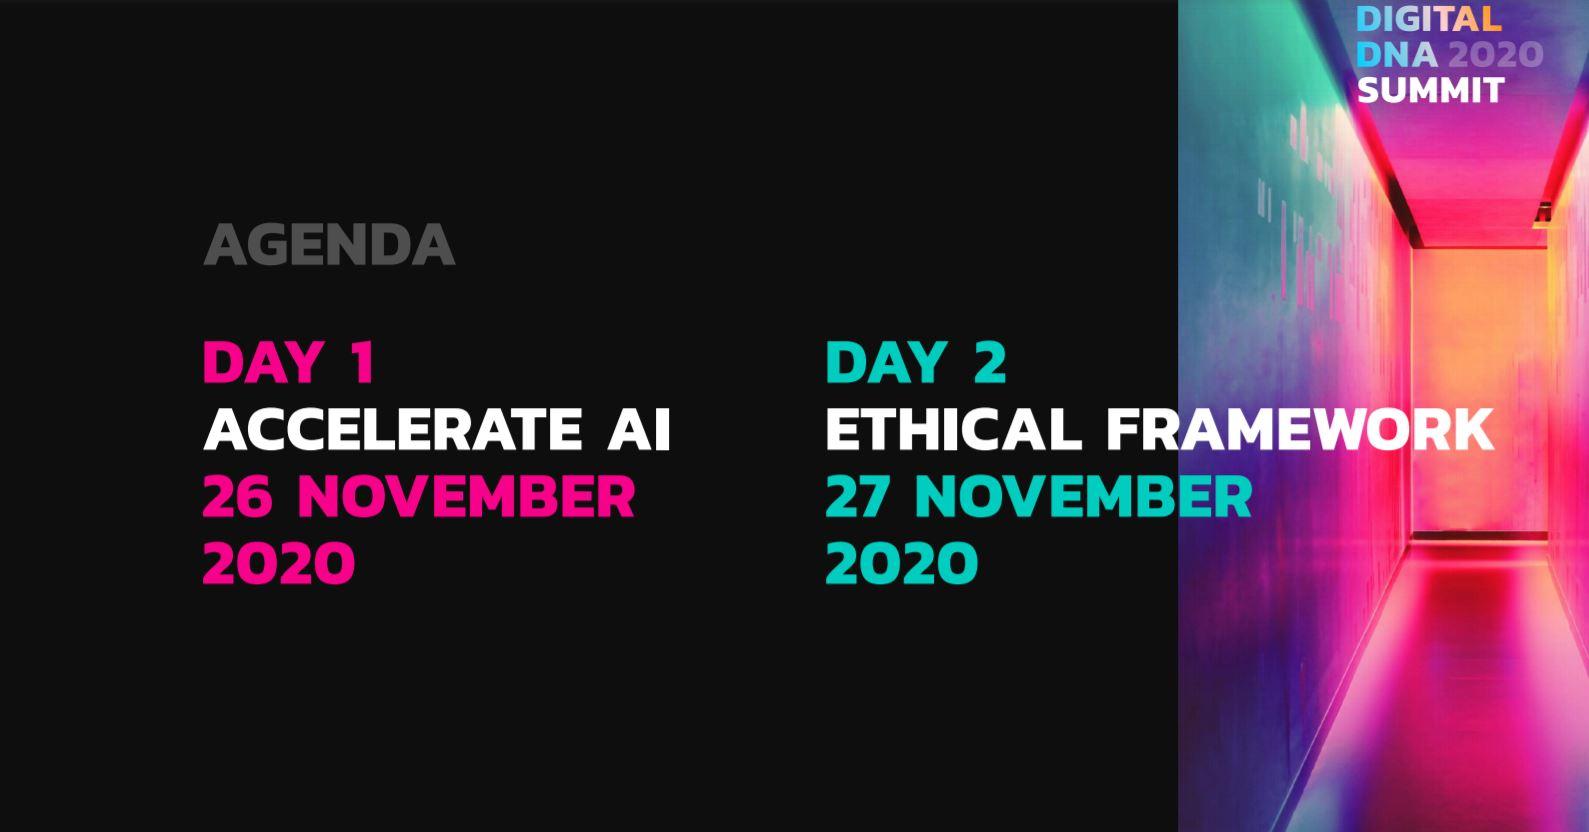 Digital DNA Summit